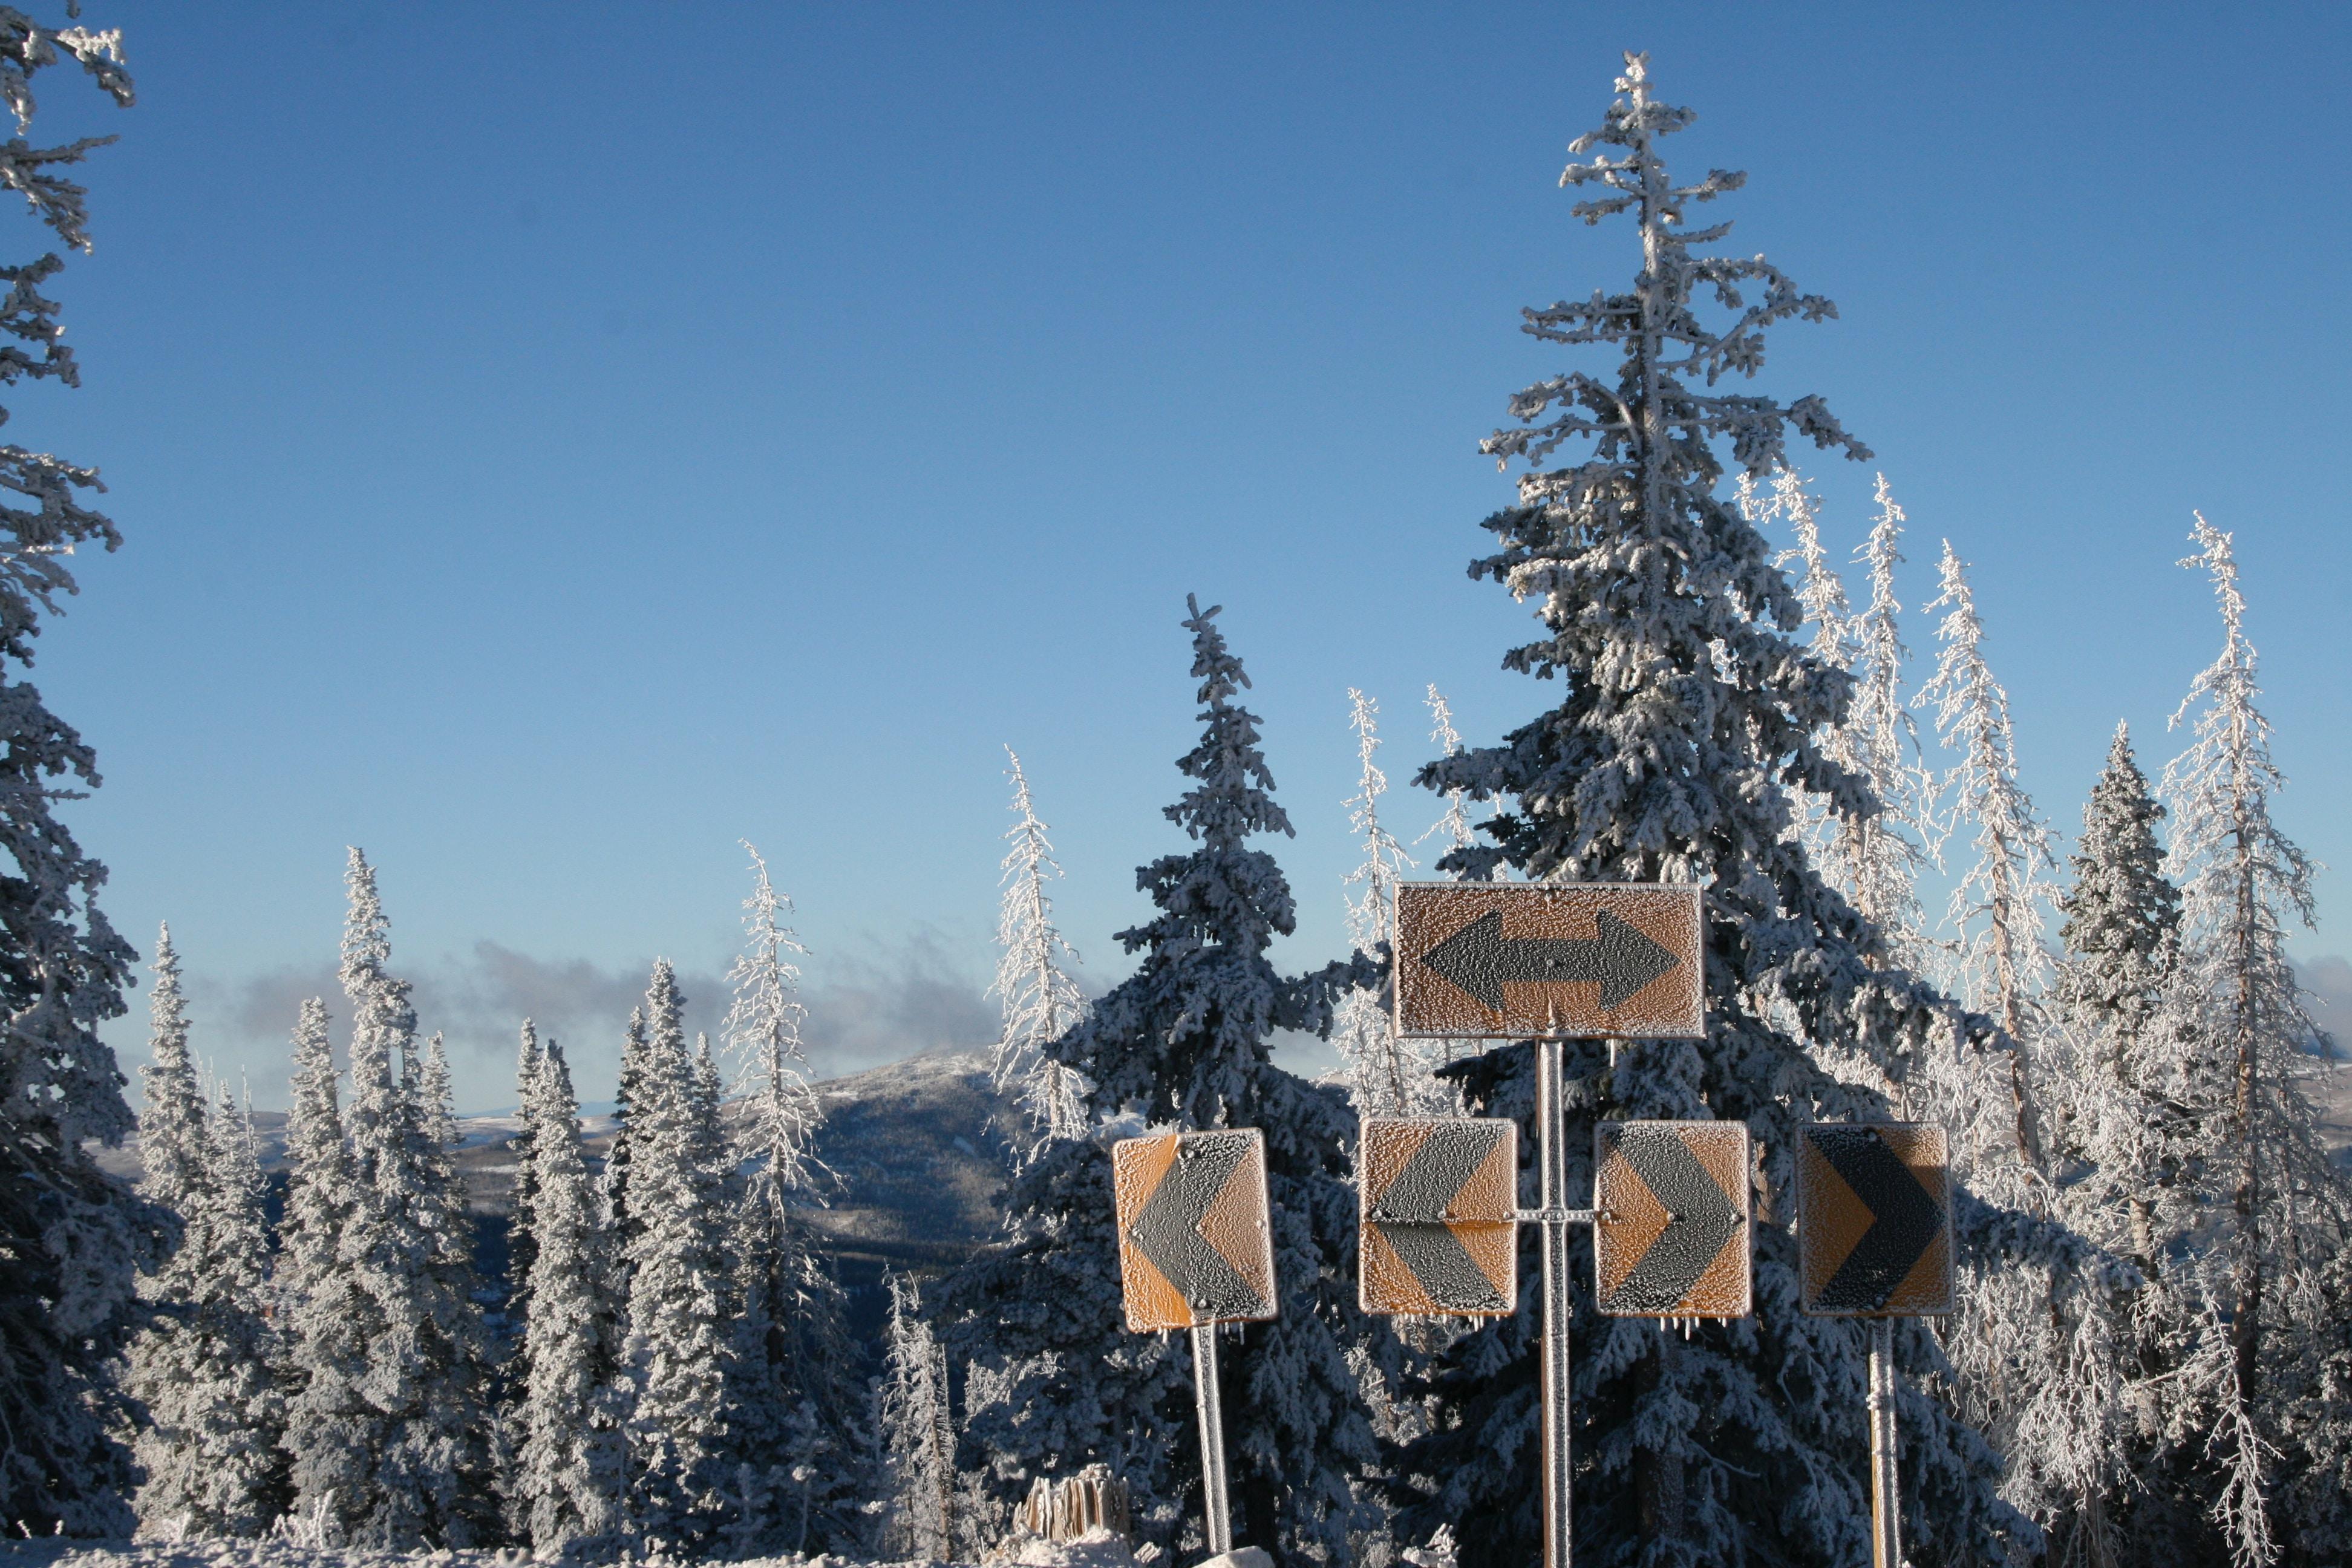 Winter in Cedar Breaks National Monument